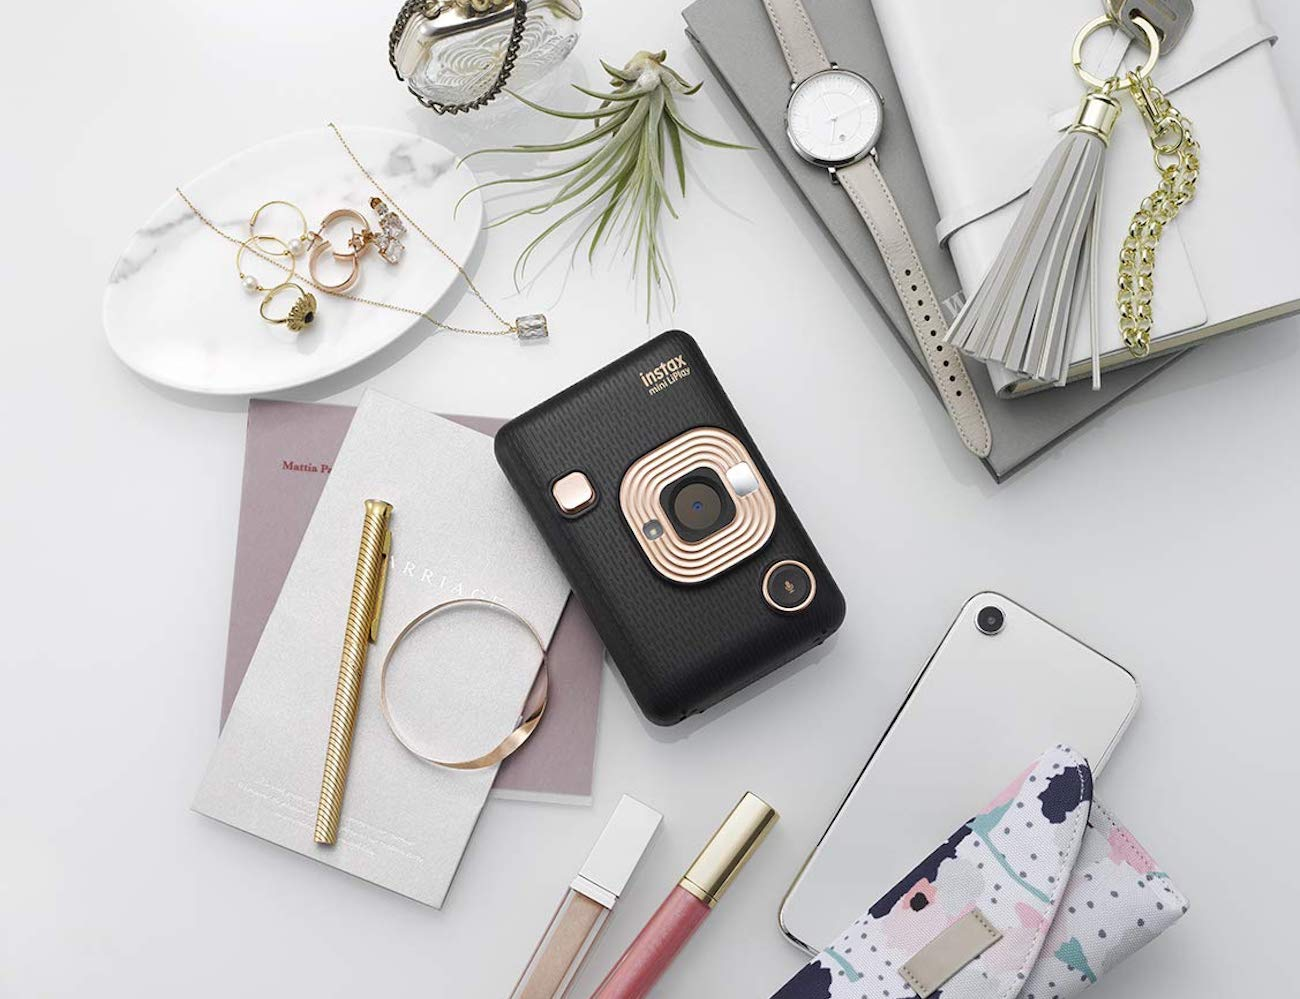 Fujifilm Instax Mini LiPlay Smartphone Printer Camera lets you print out photos on the go